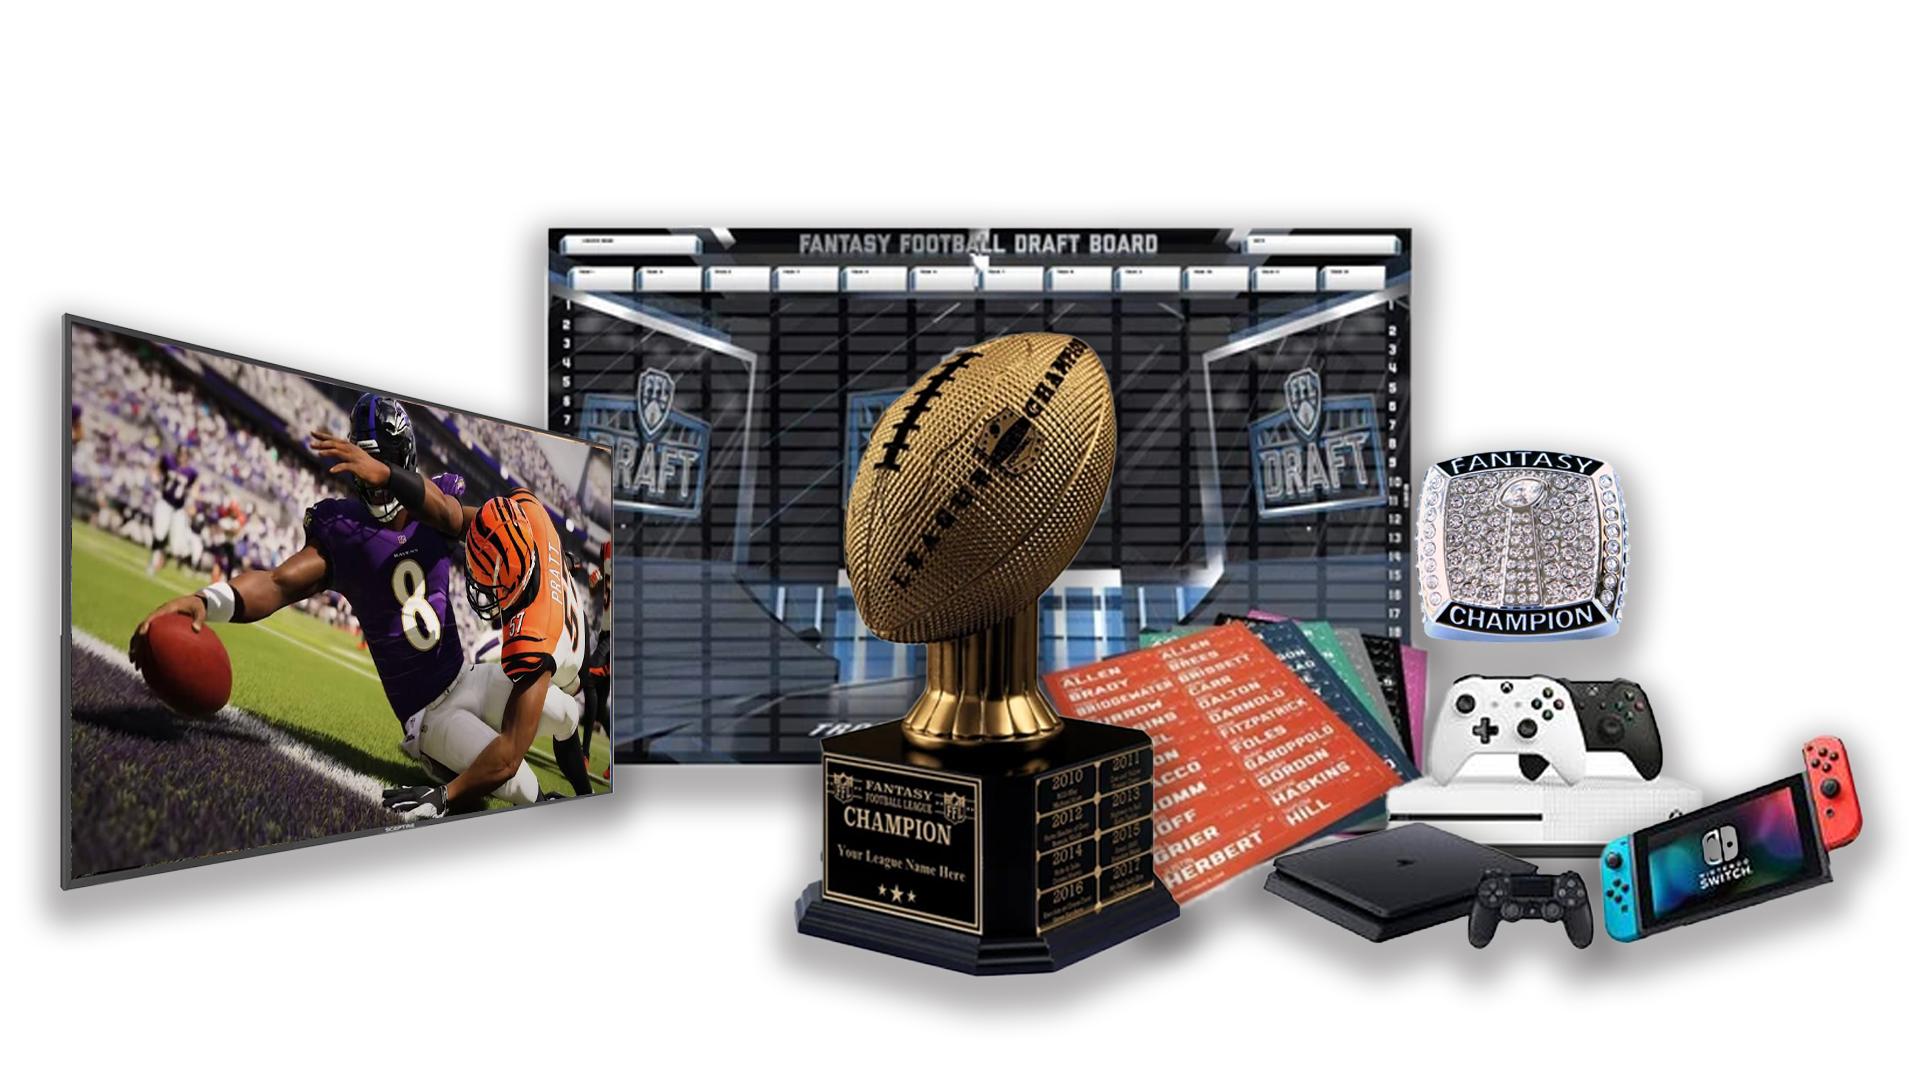 - FFDraft Trophy Gold - Fantasy Football Draft Parties at 1Life2Play